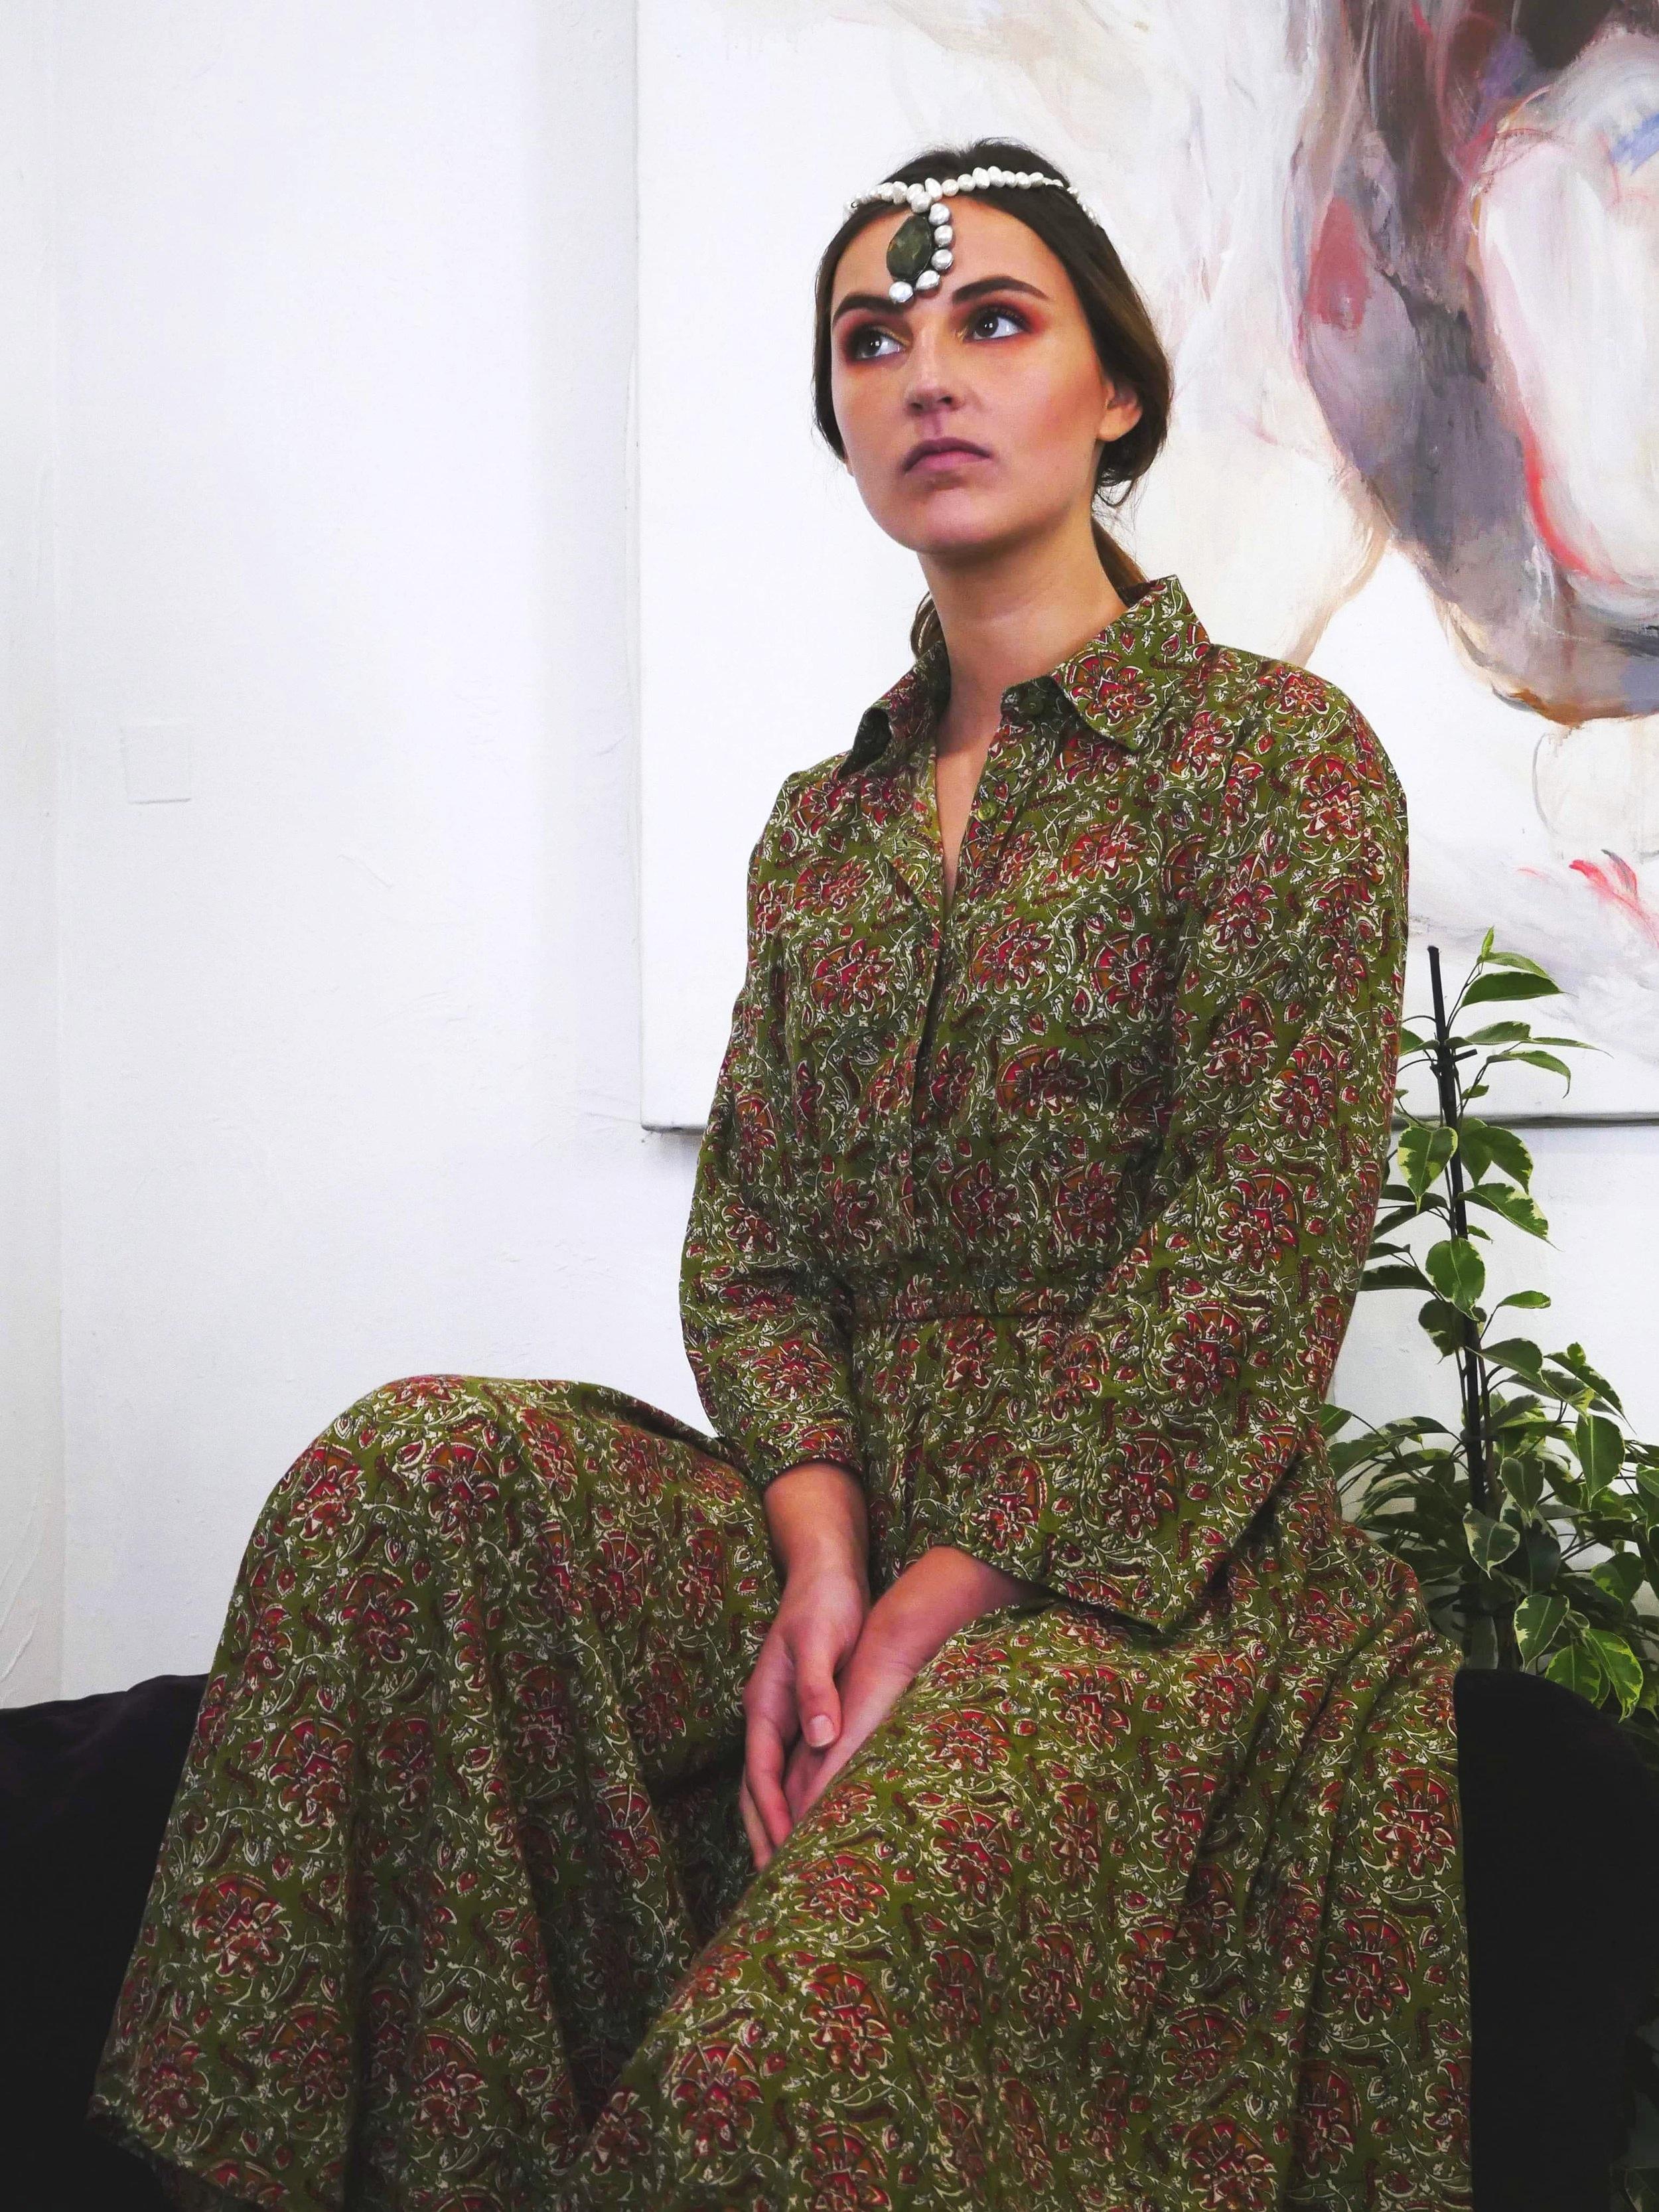 ANA KAKI LONG DRESS - 100% Indian Cotton, Made in Bangladesh with love